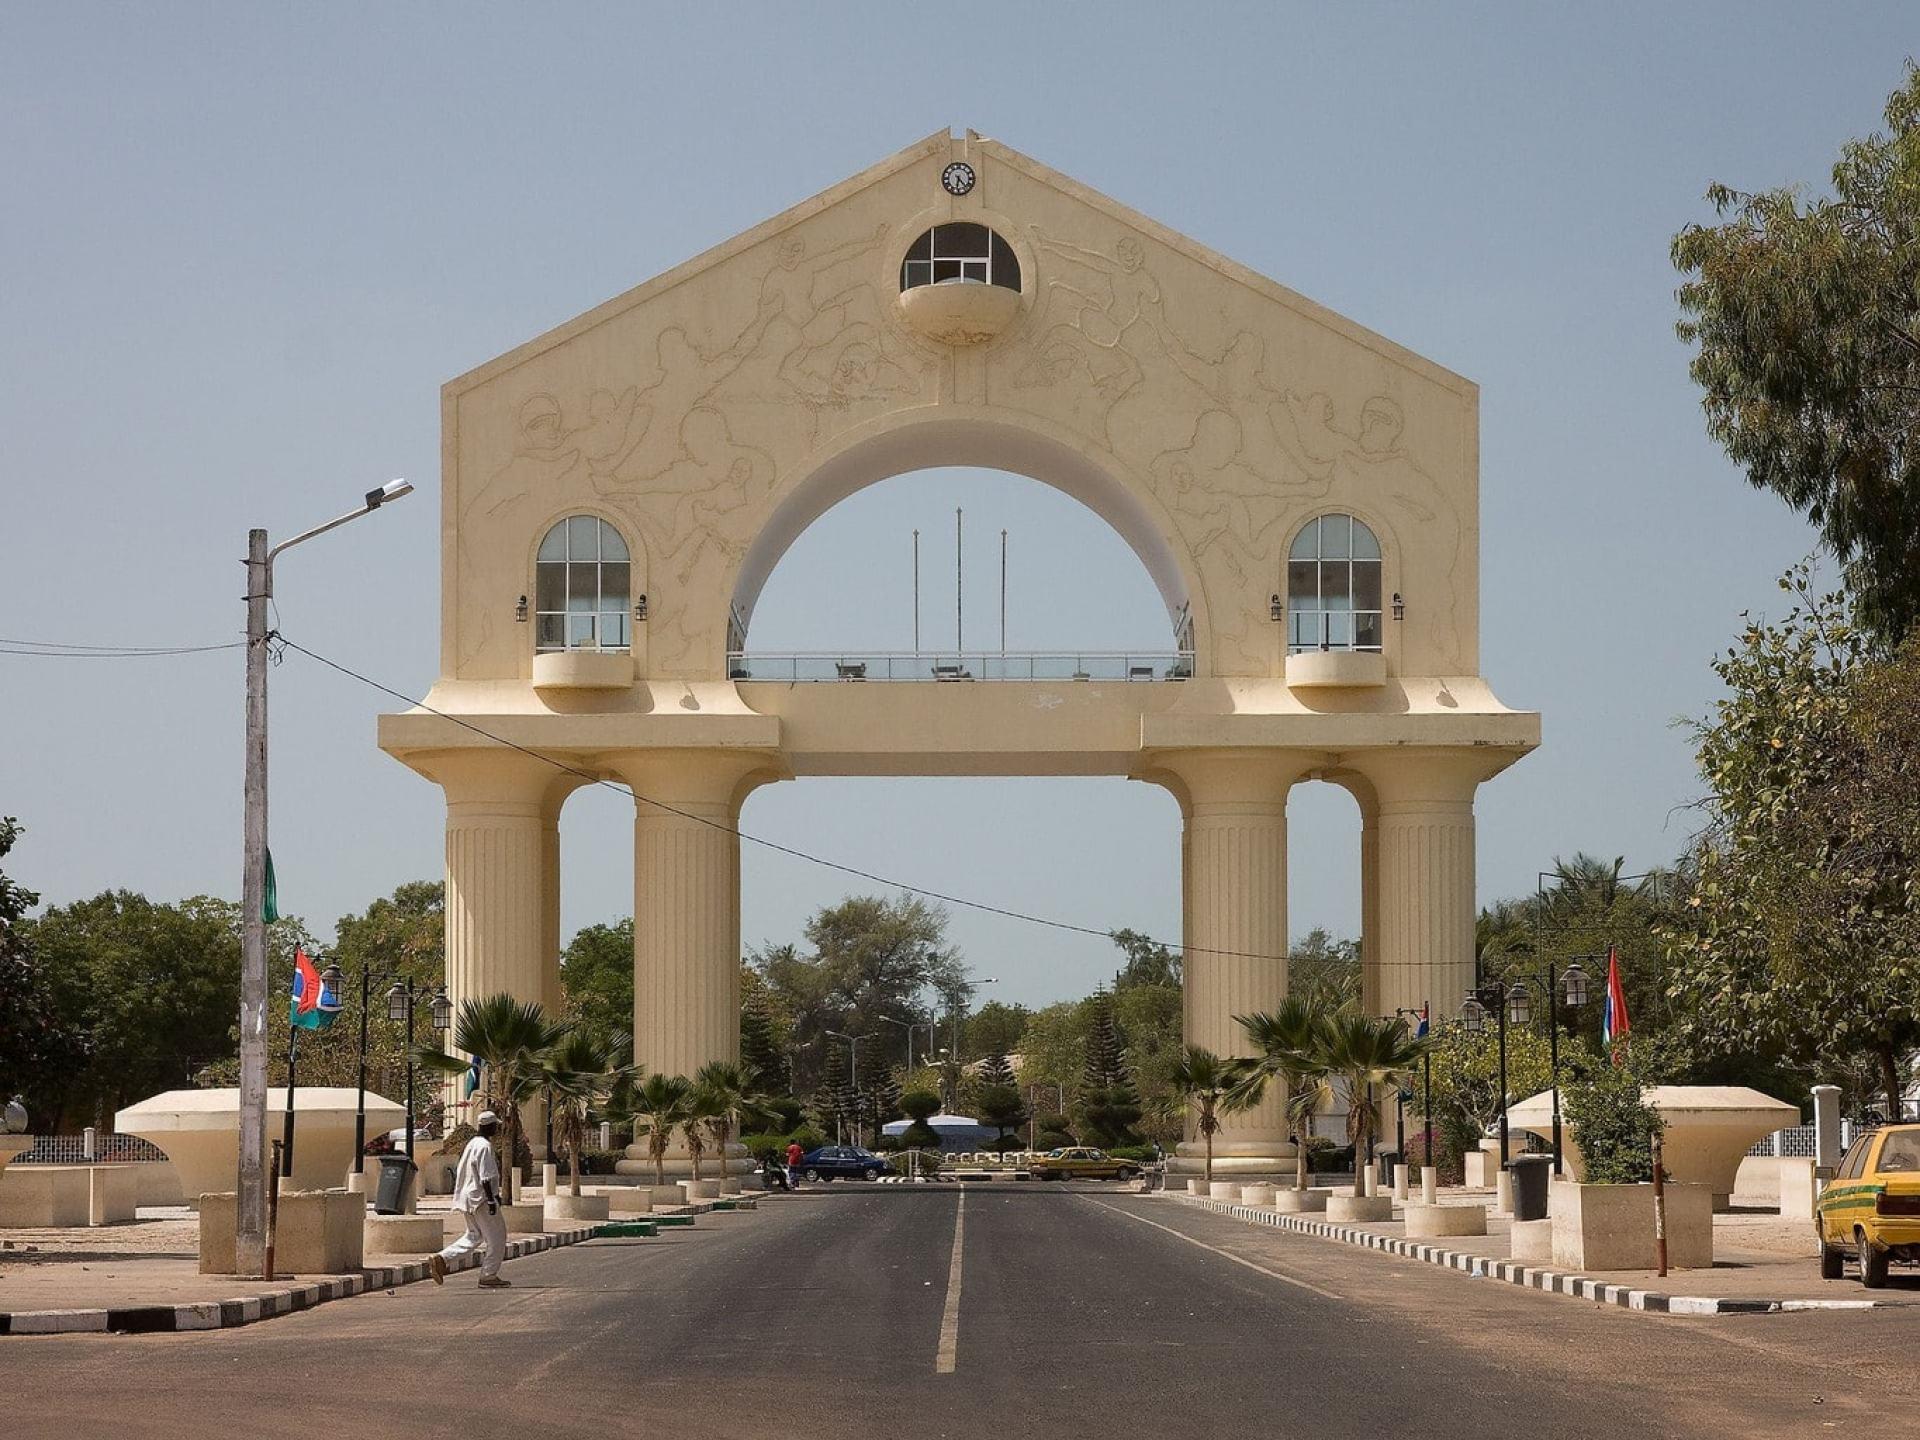 Banjul Arch, Gambia